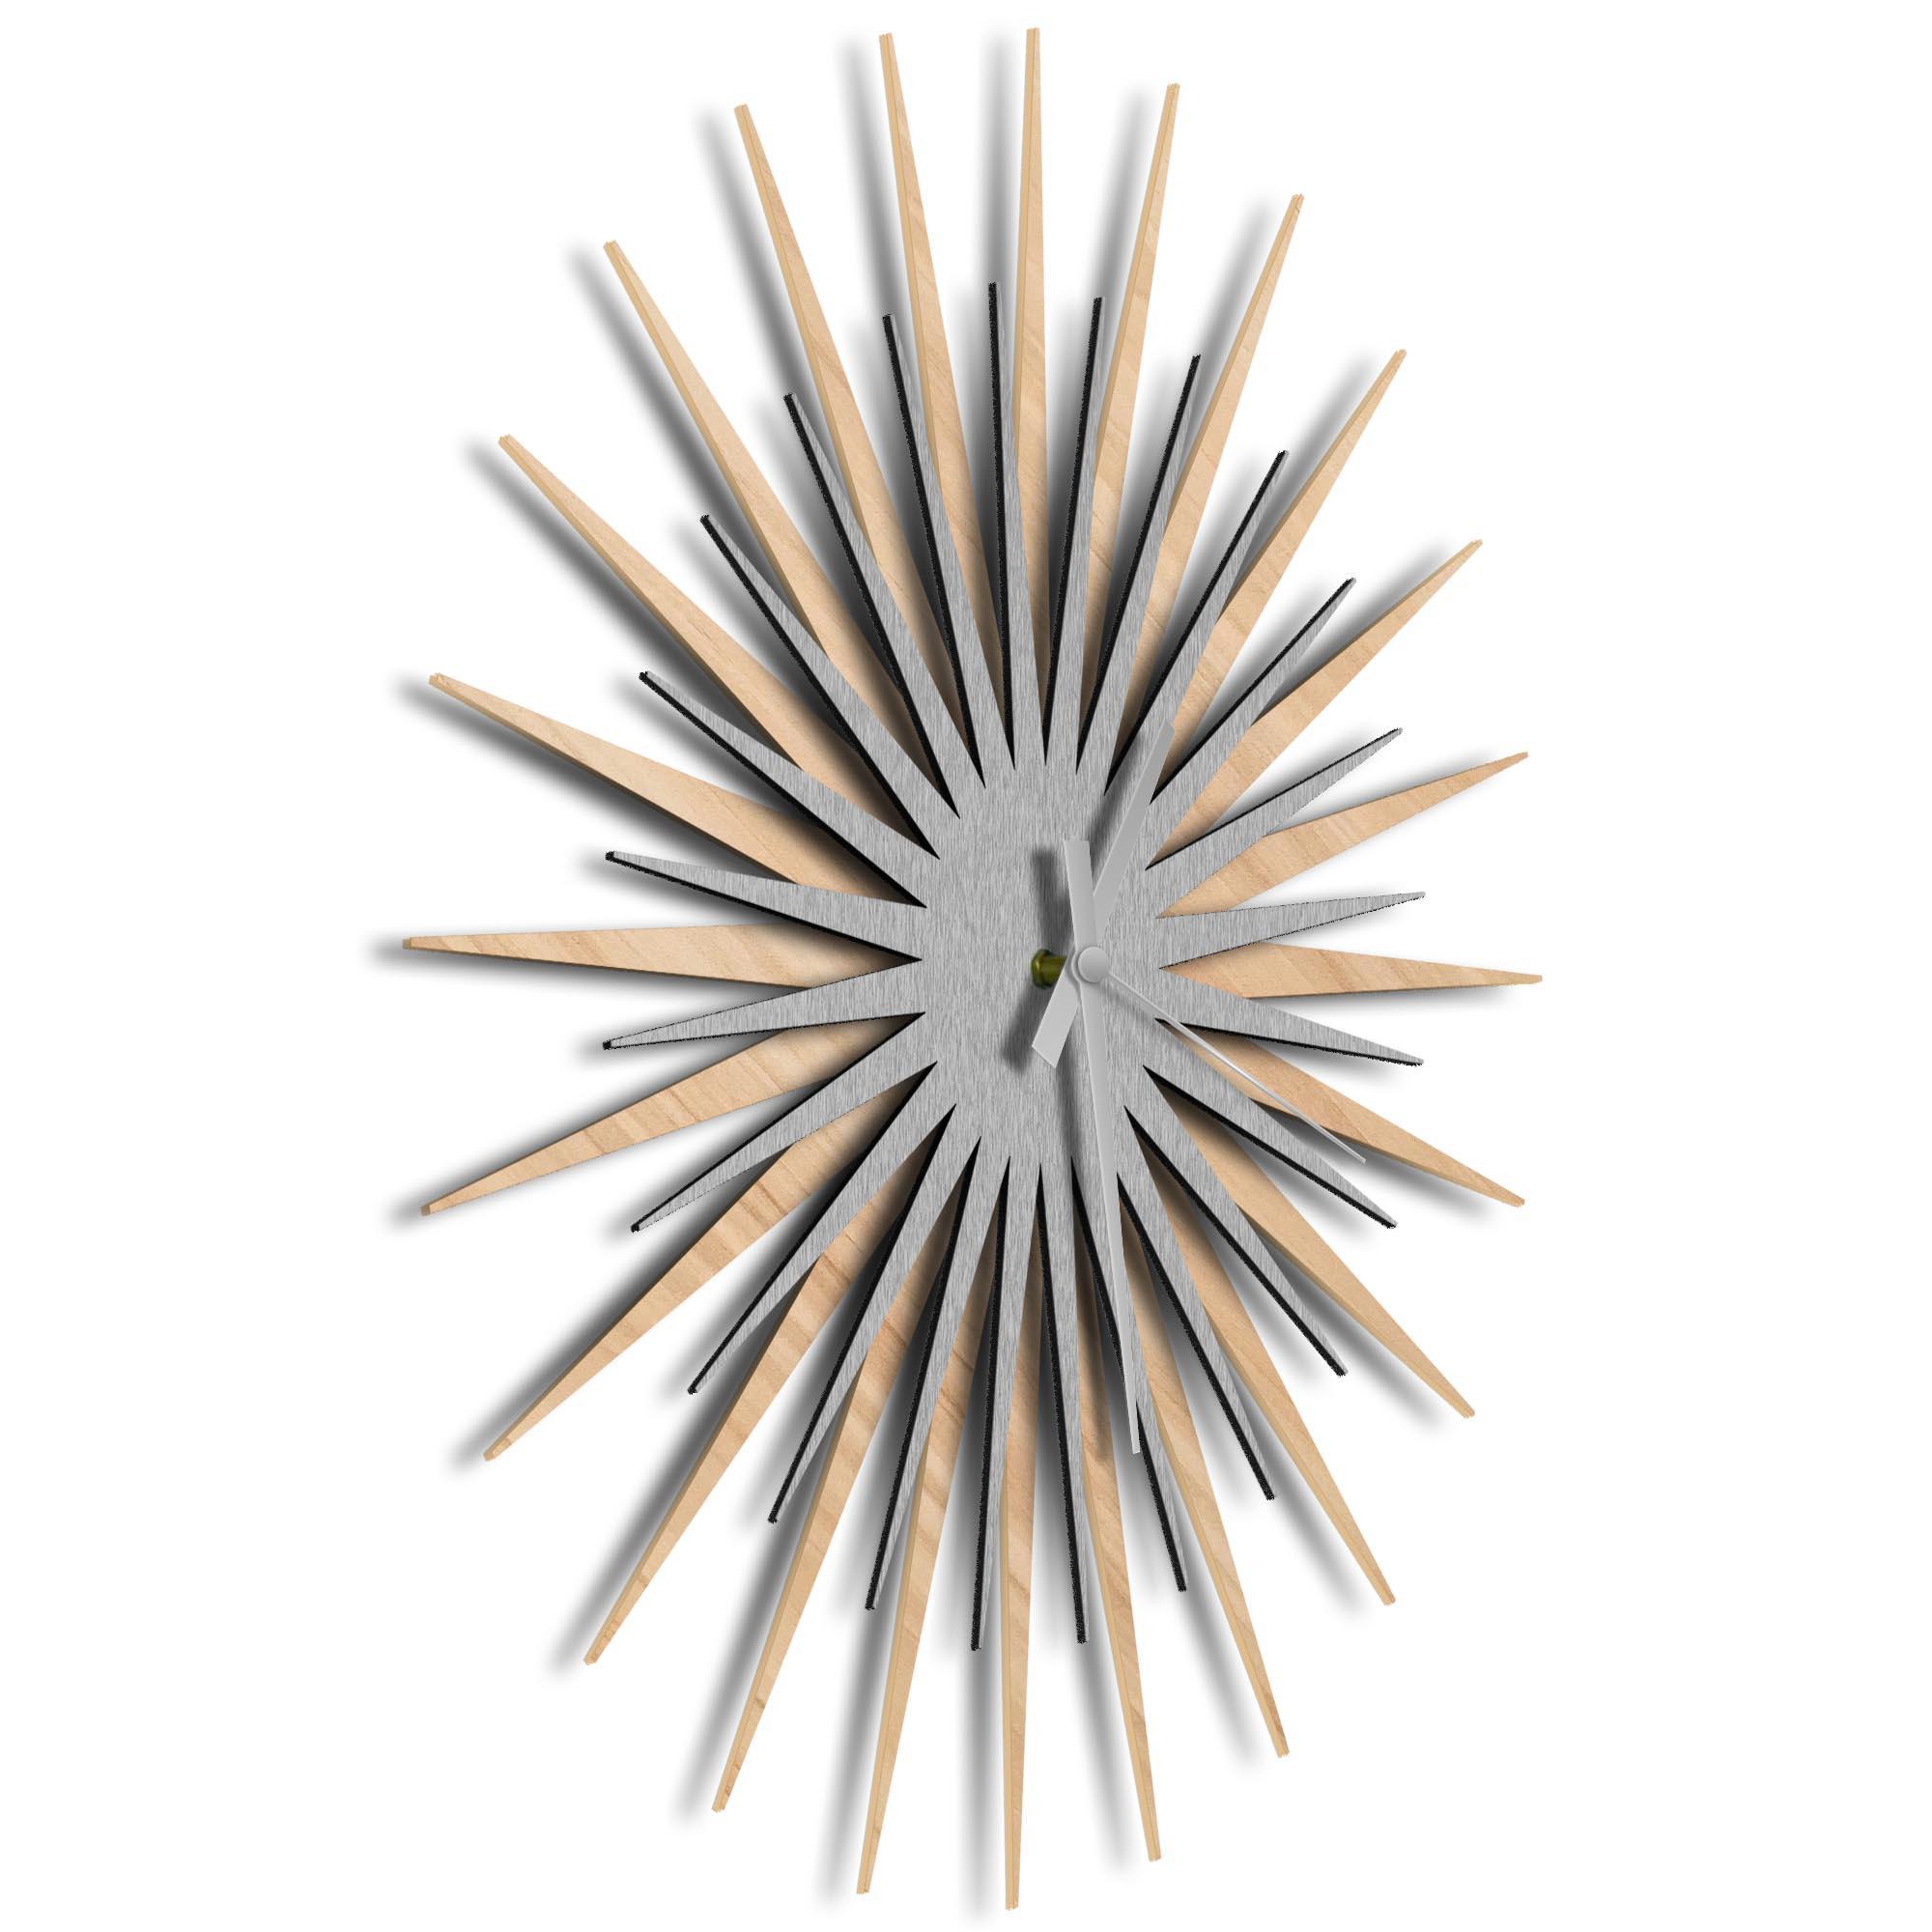 Atomic Era Clock Maple Silver Grey by Adam Schwoeppe - Mid-Century Modern Clock on Brushed Maple Polymetal - Image 2